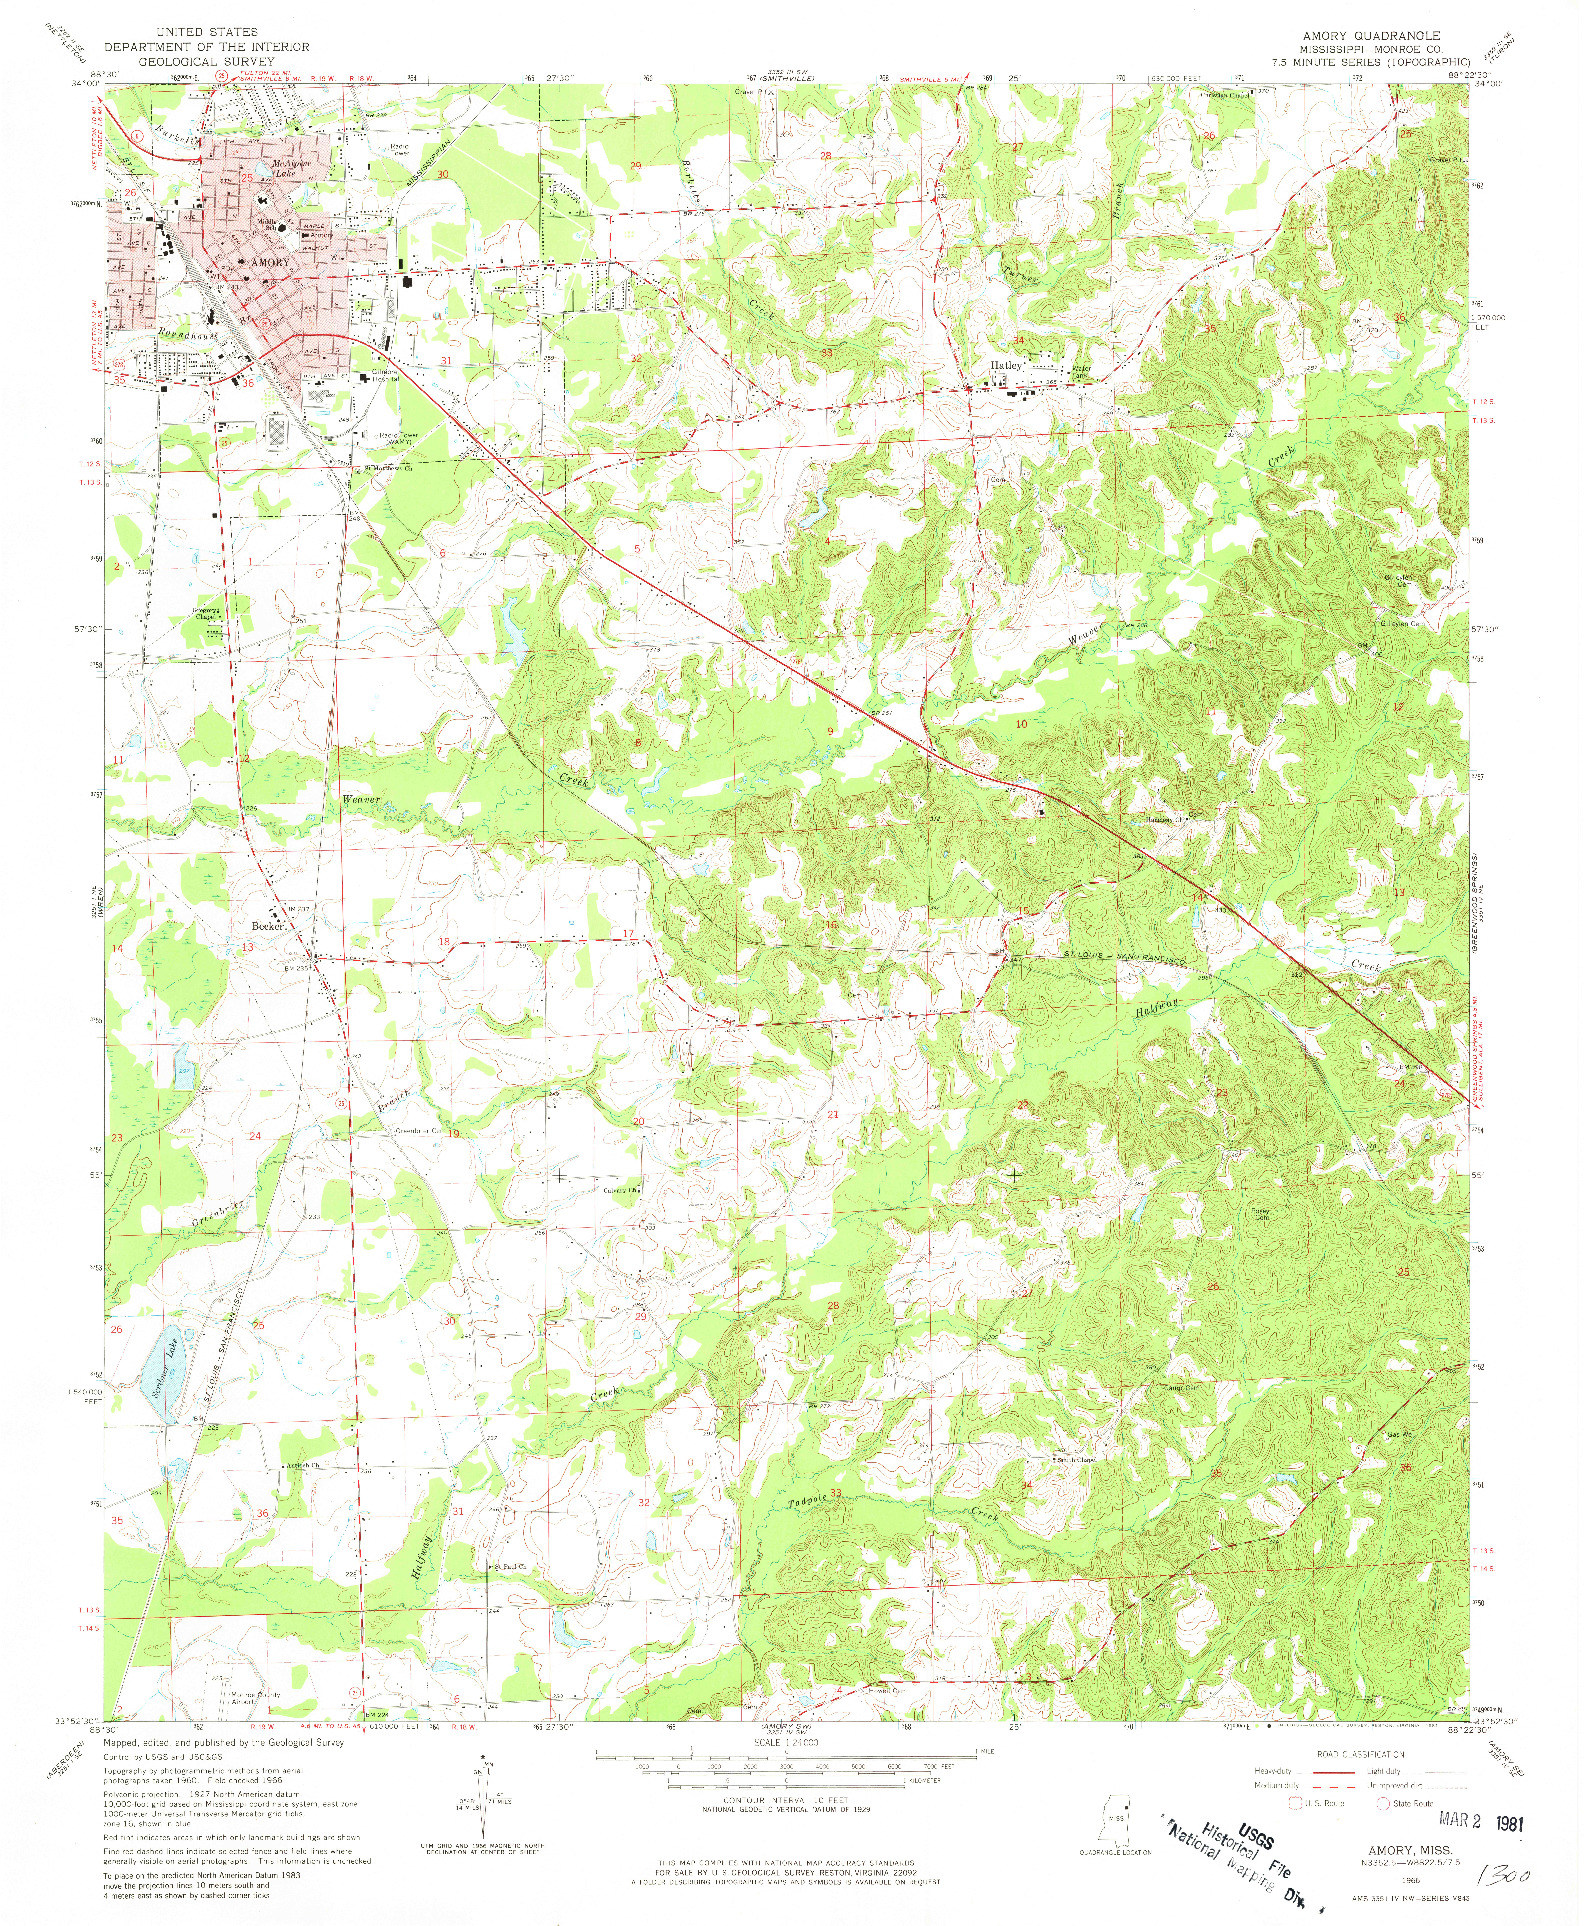 USGS 1:24000-SCALE QUADRANGLE FOR AMORY, MS 1966